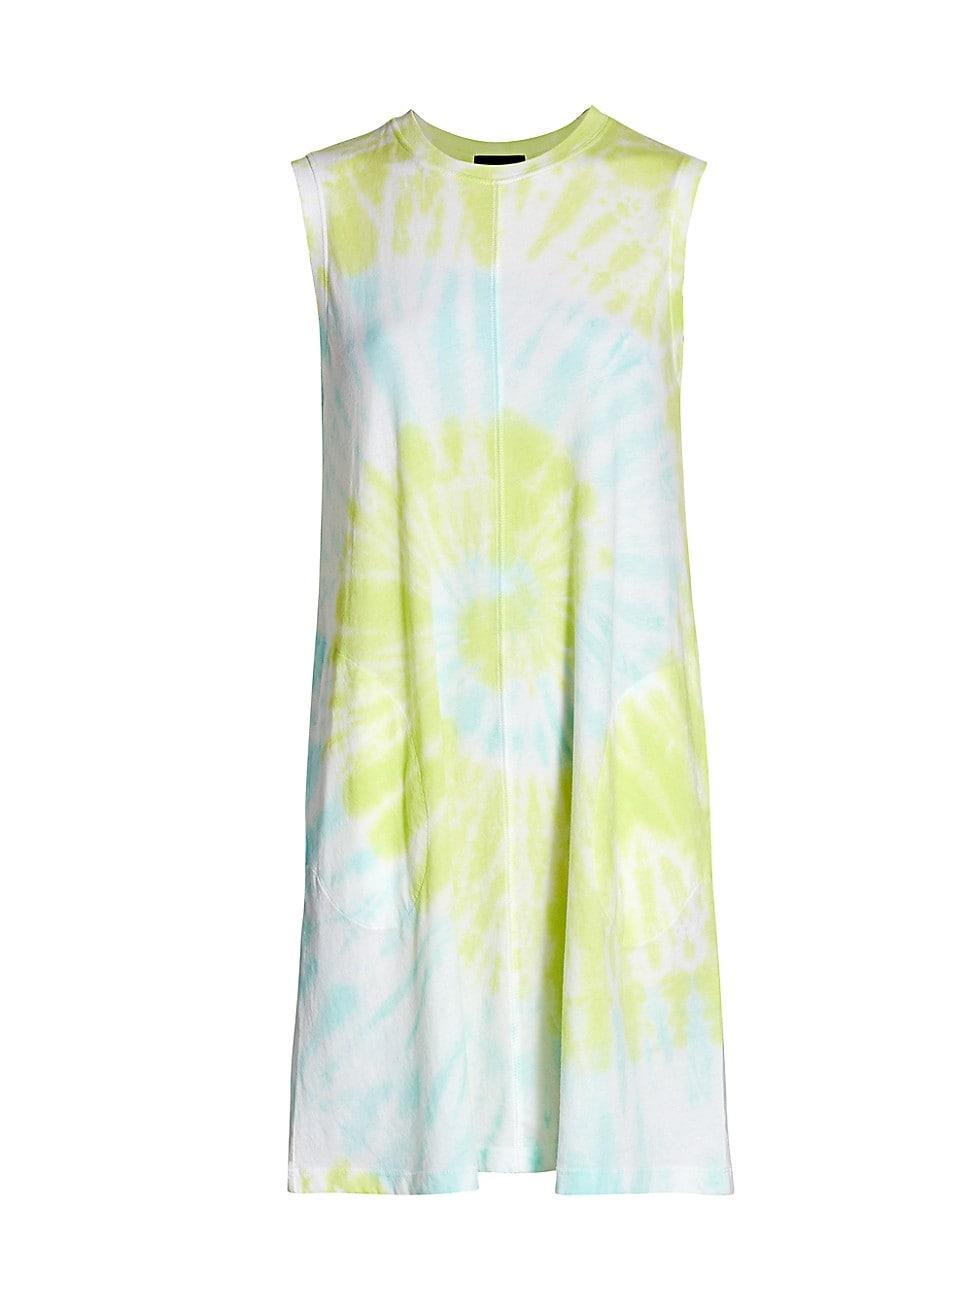 Atm Anthony Thomas Melillo WOMEN'S TIE-DYE TANK DRESS